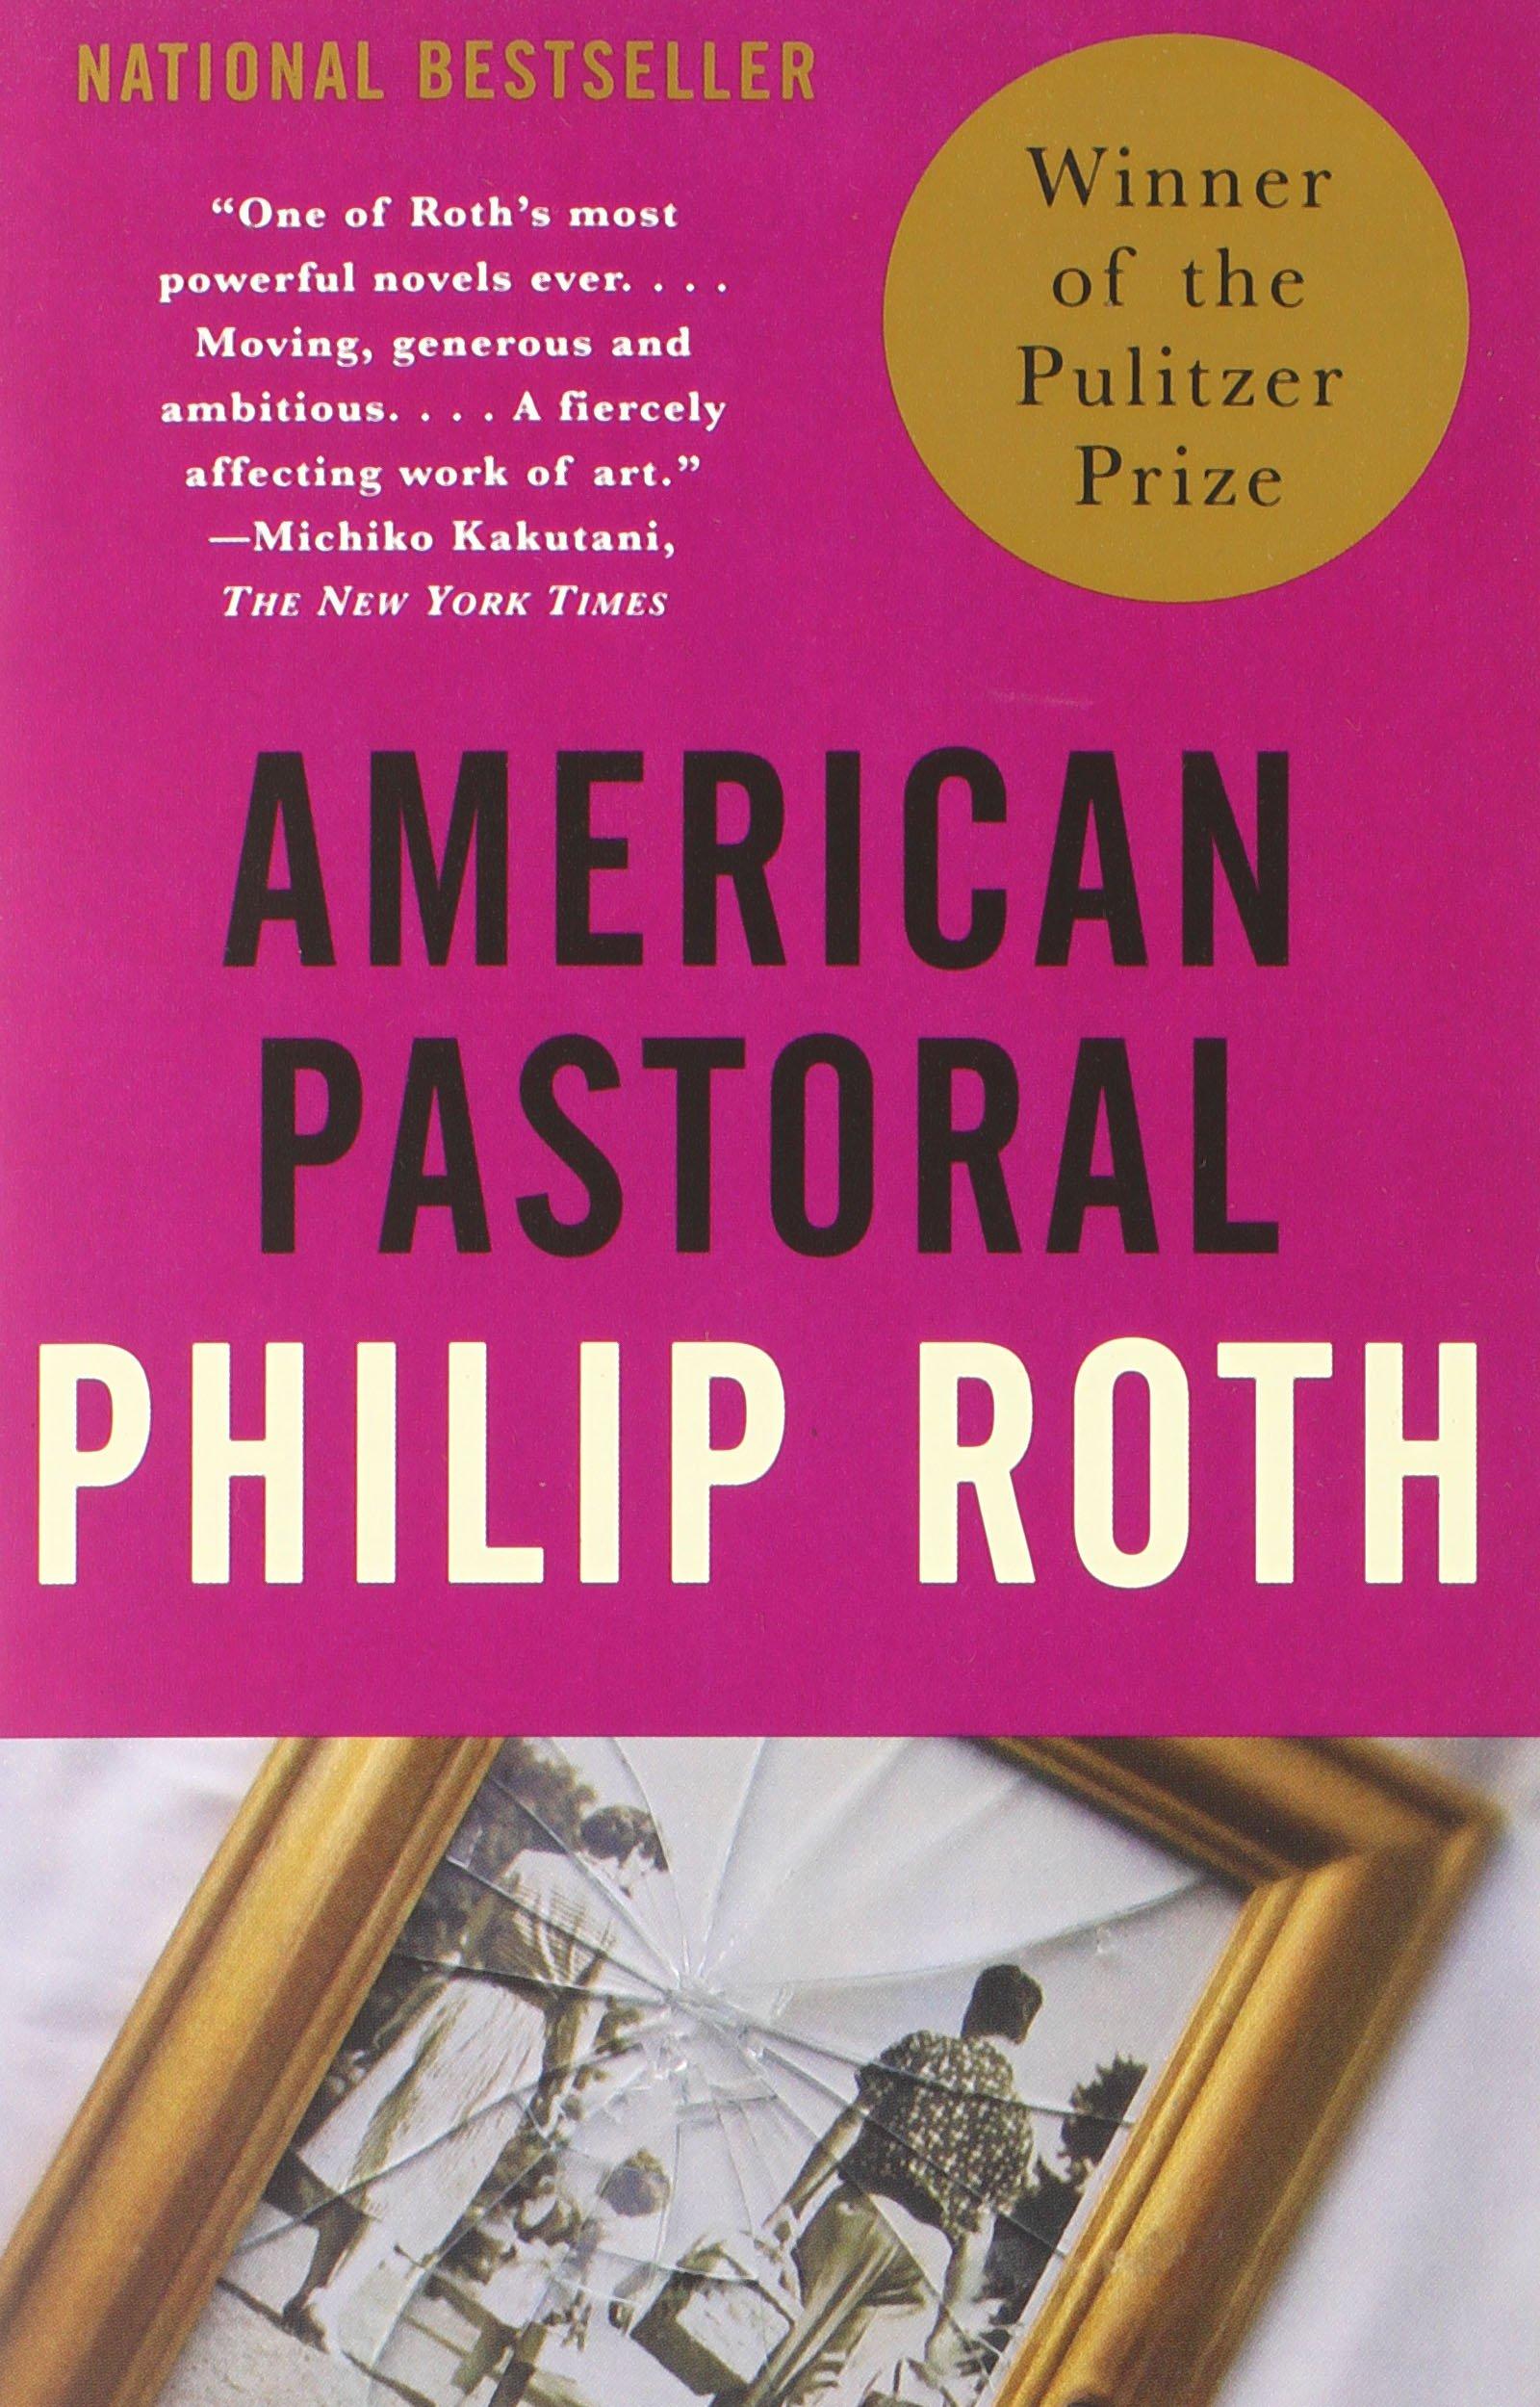 American Pastoral ISBN-13 9780375701429